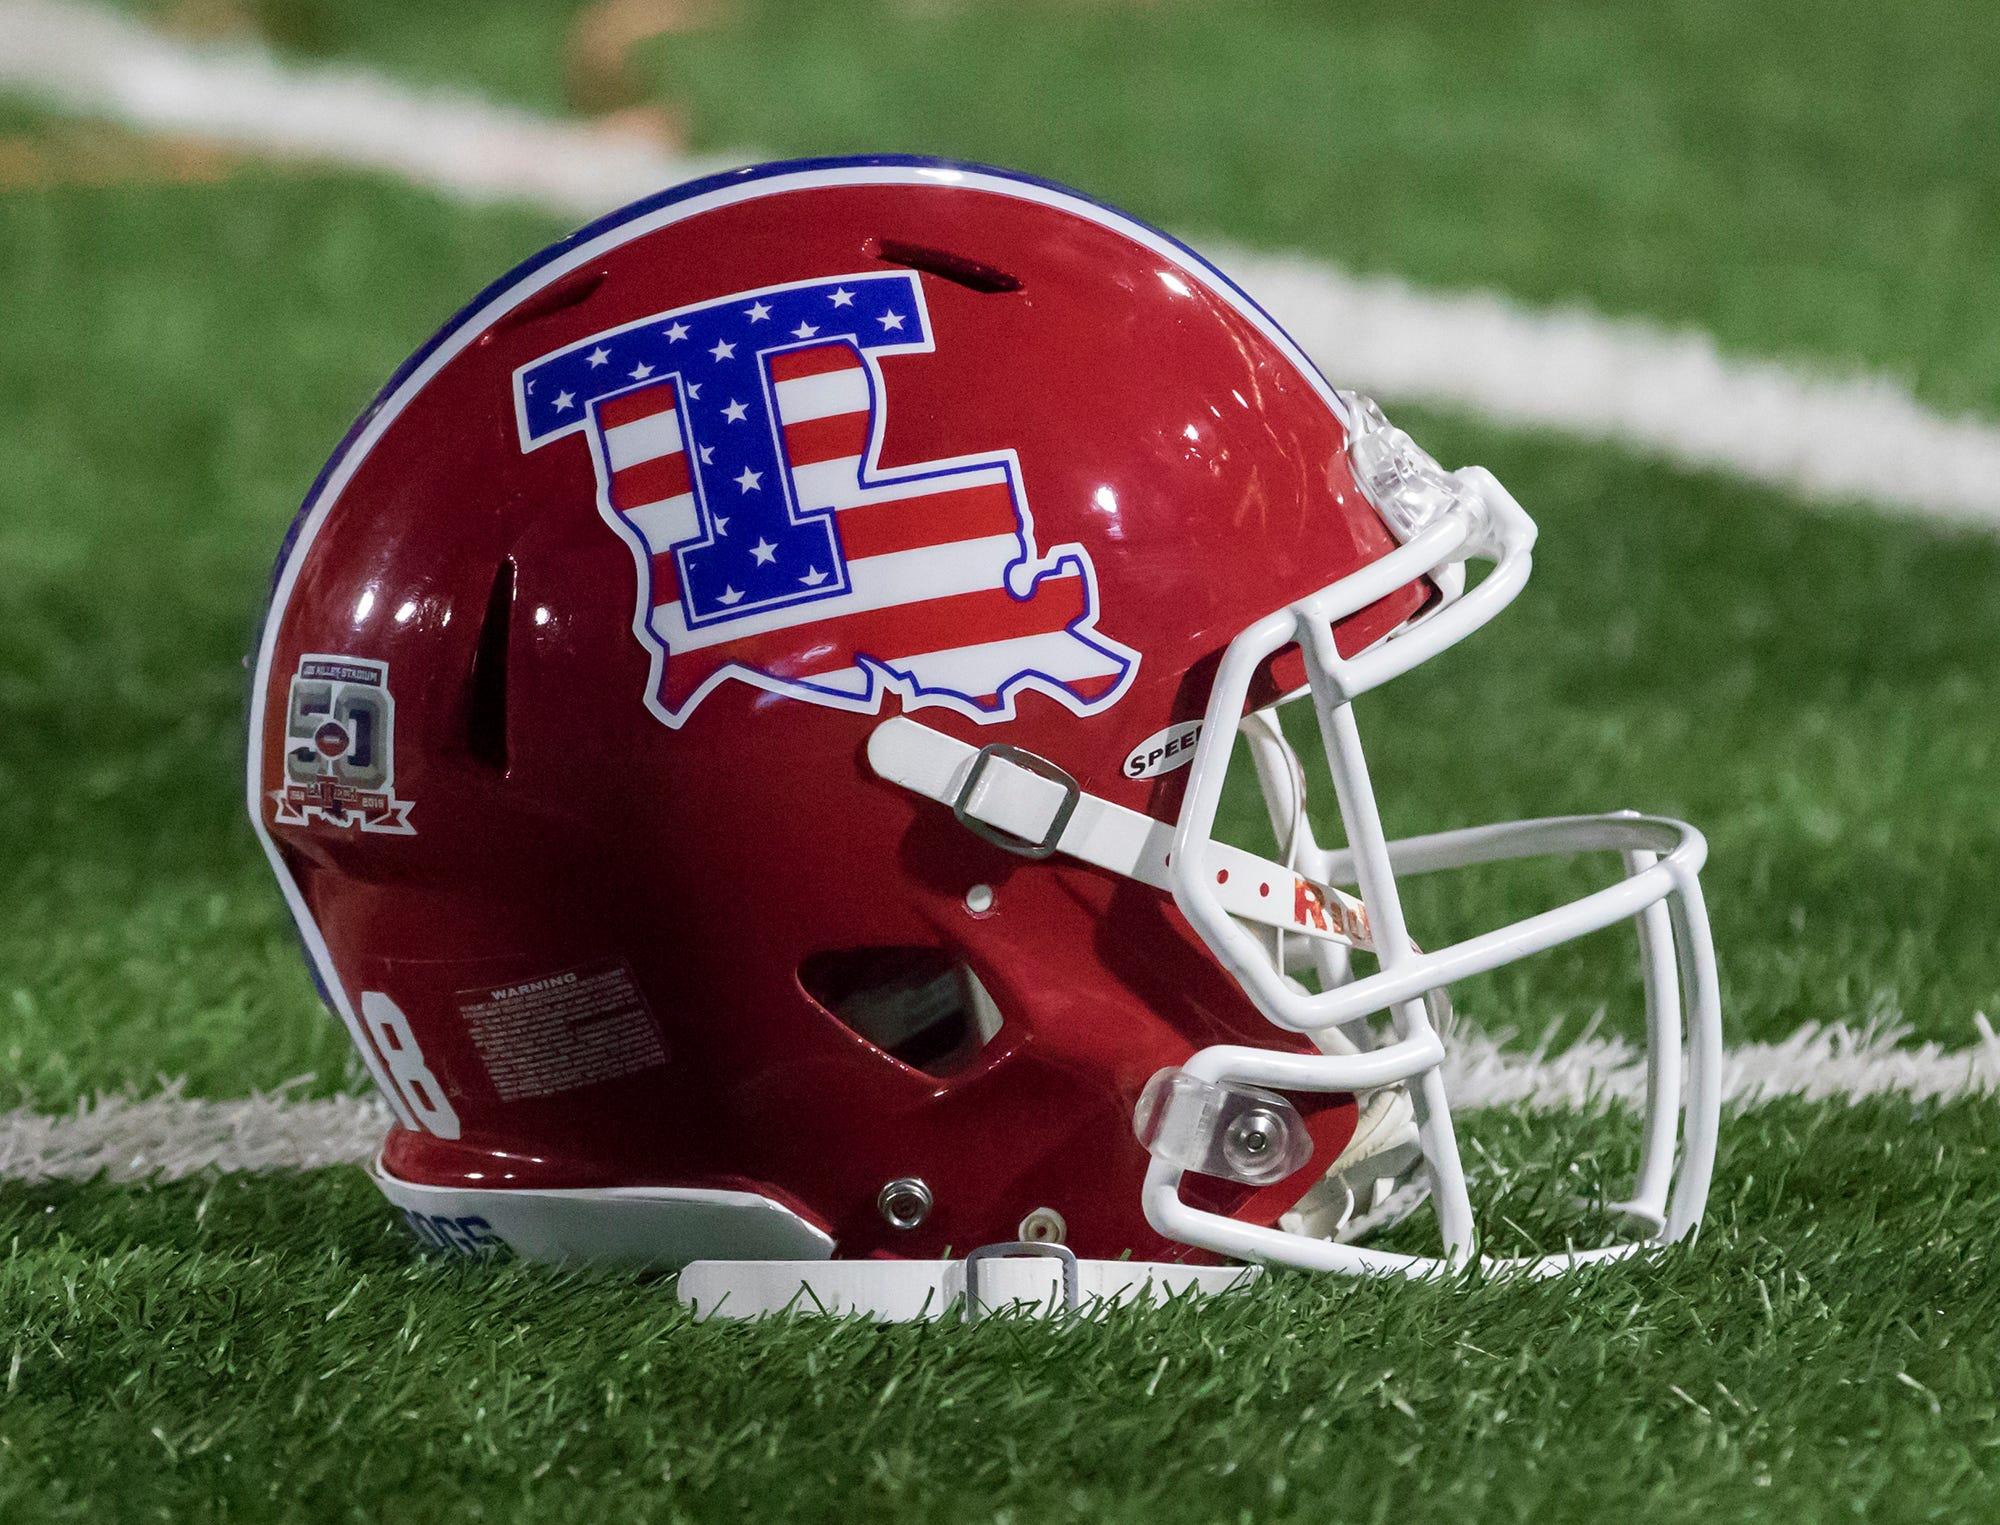 Louisiana Tech Football Adds Byu To 2020 Schedule